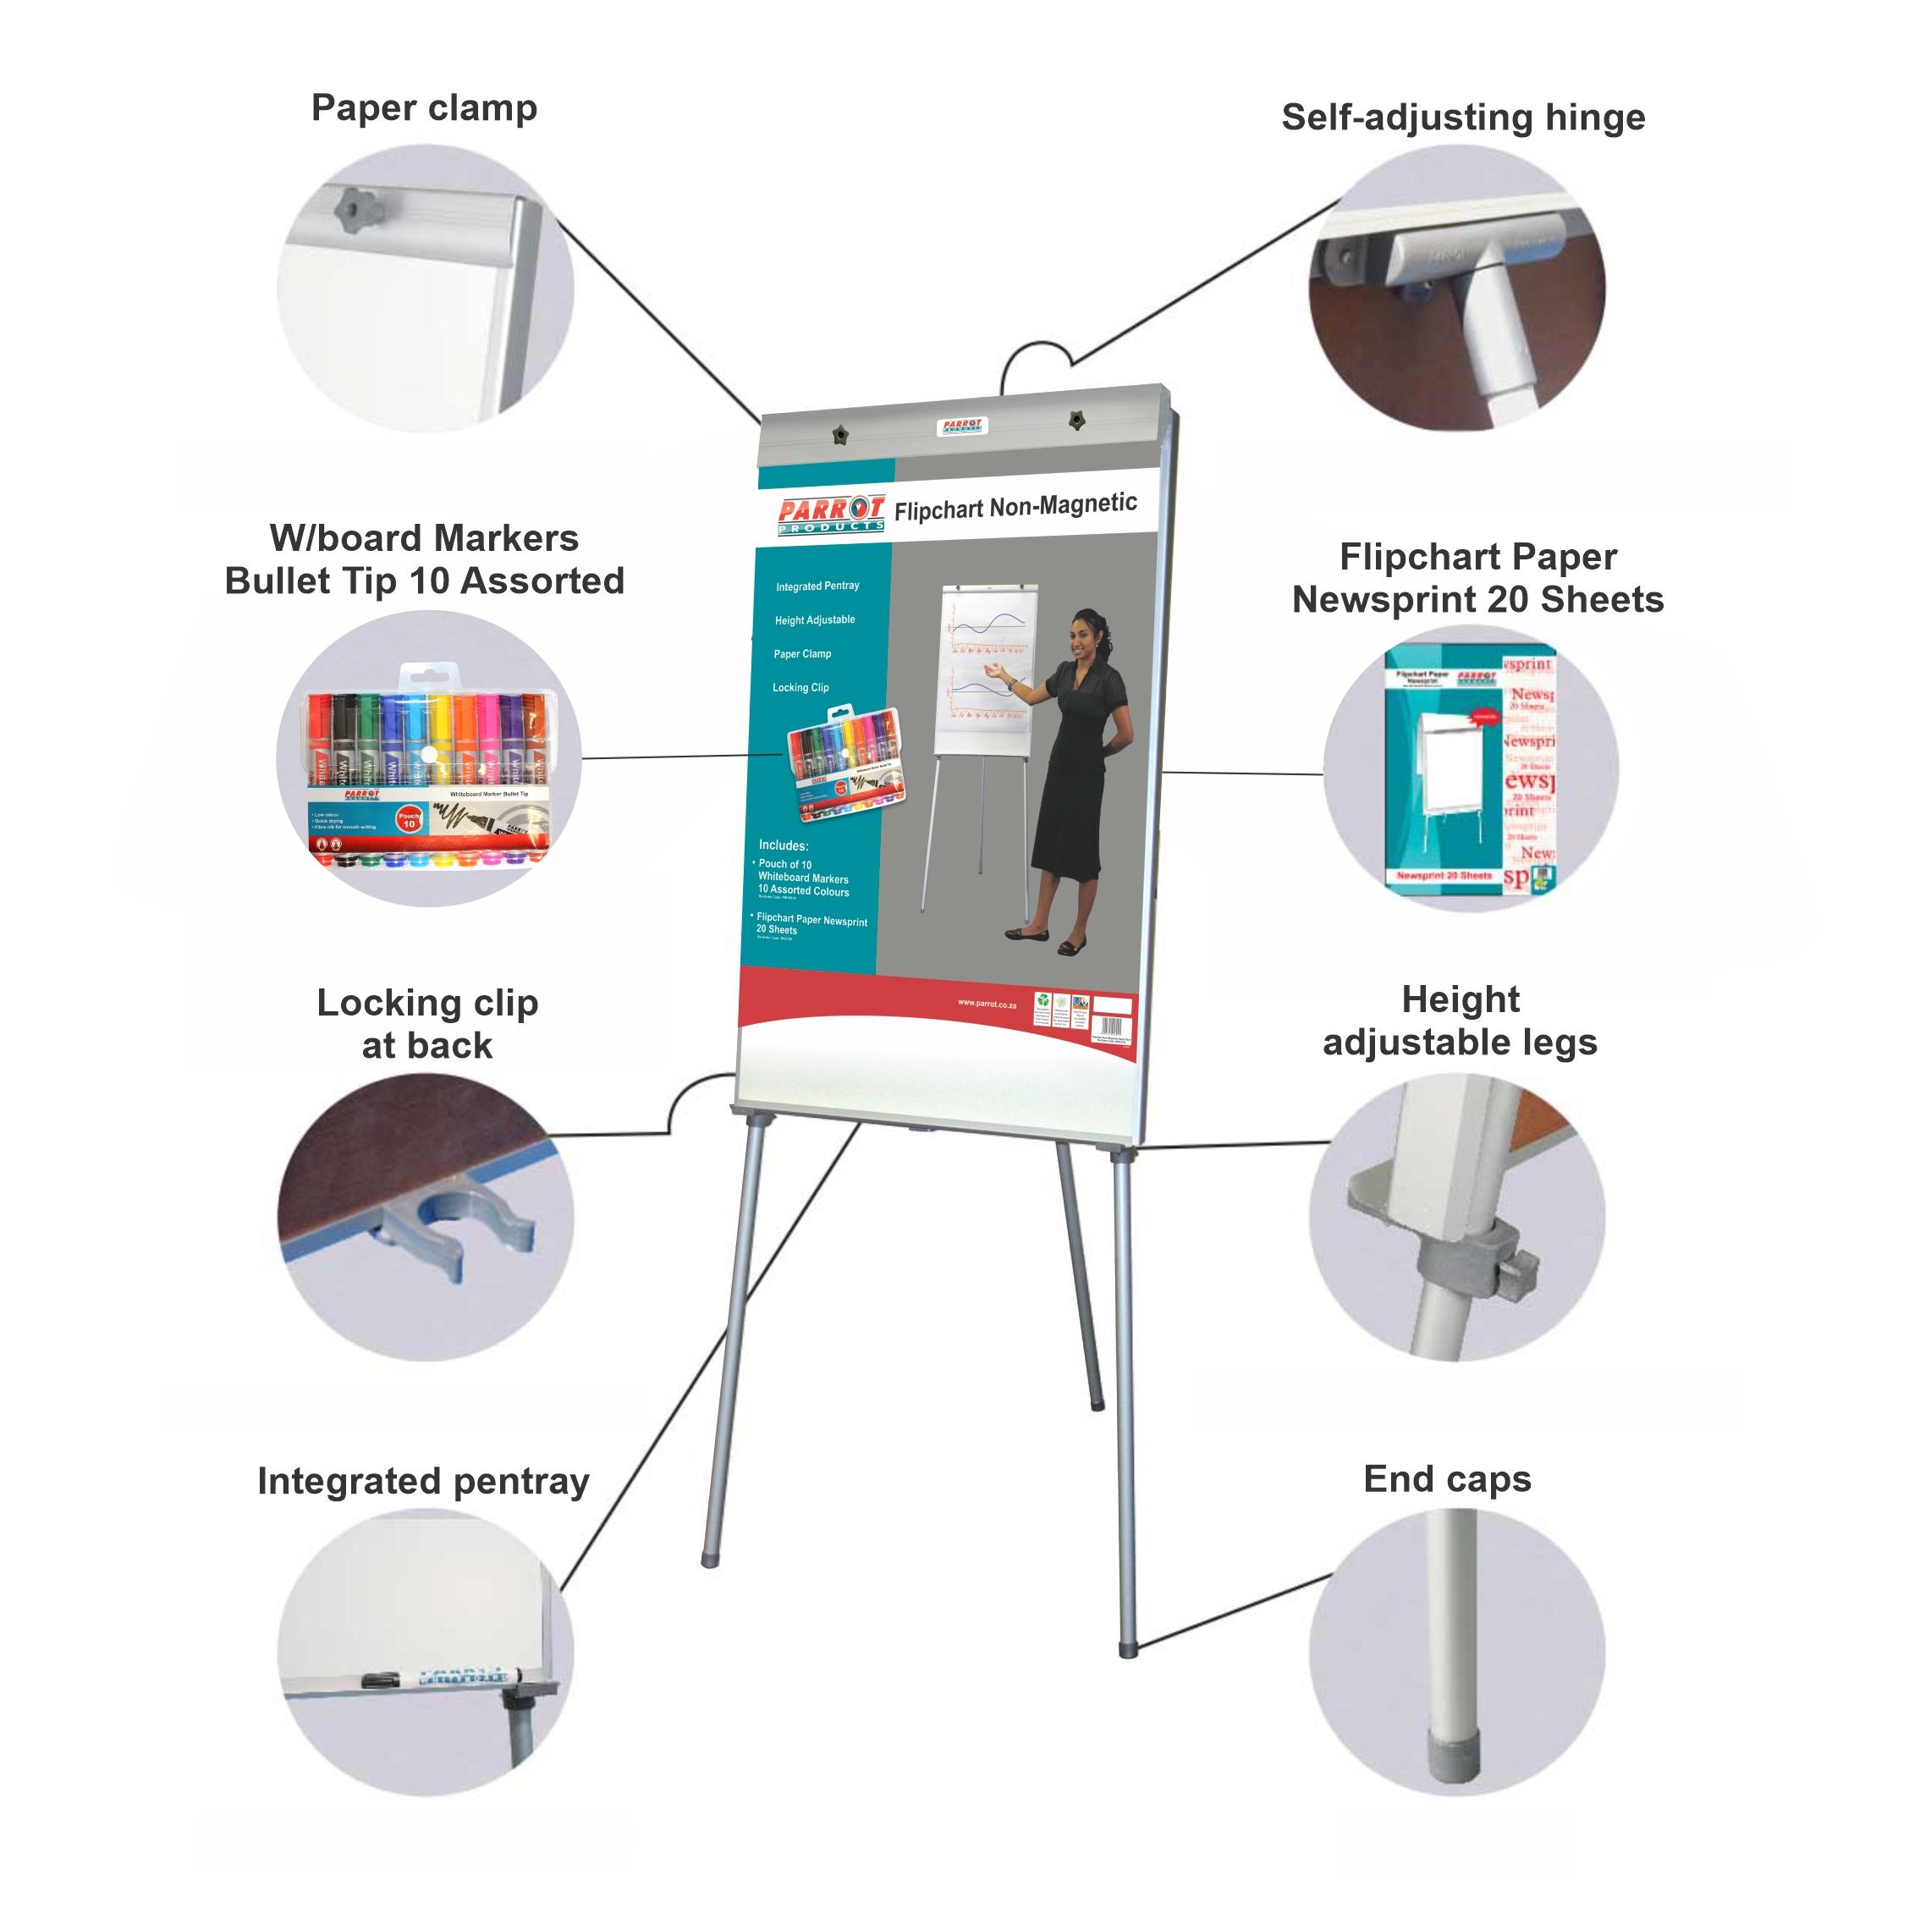 Flipchart Non-Magnetic Standard (1000*640mm, Retail)